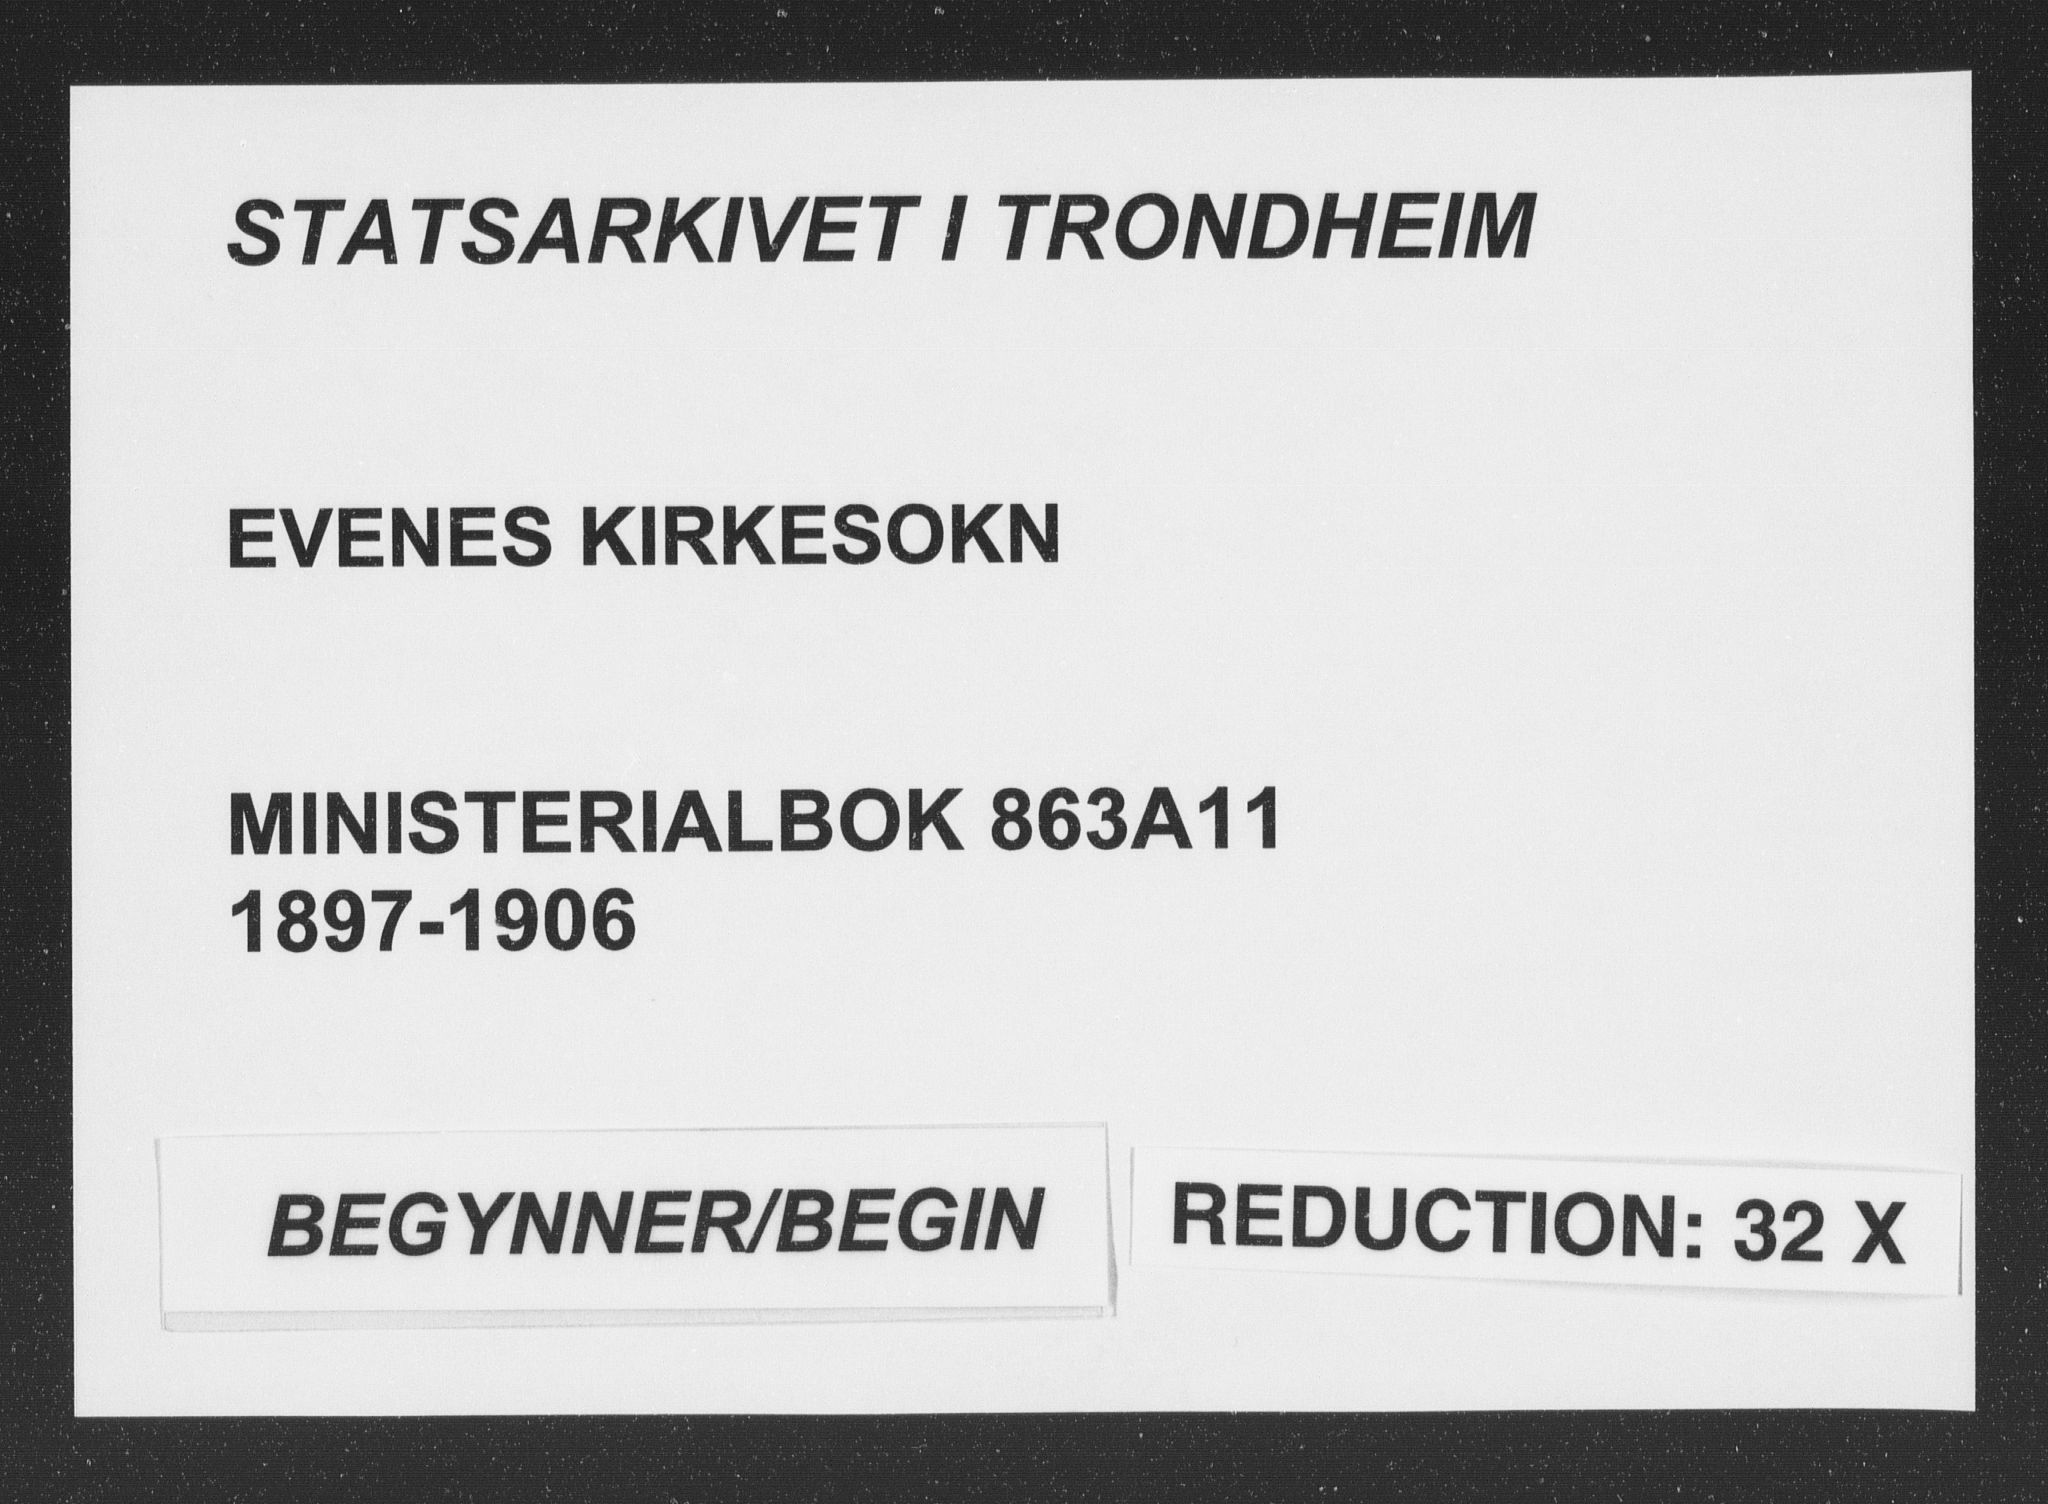 SAT, Ministerialprotokoller, klokkerbøker og fødselsregistre - Nordland, 863/L0899: Ministerialbok nr. 863A11, 1897-1906